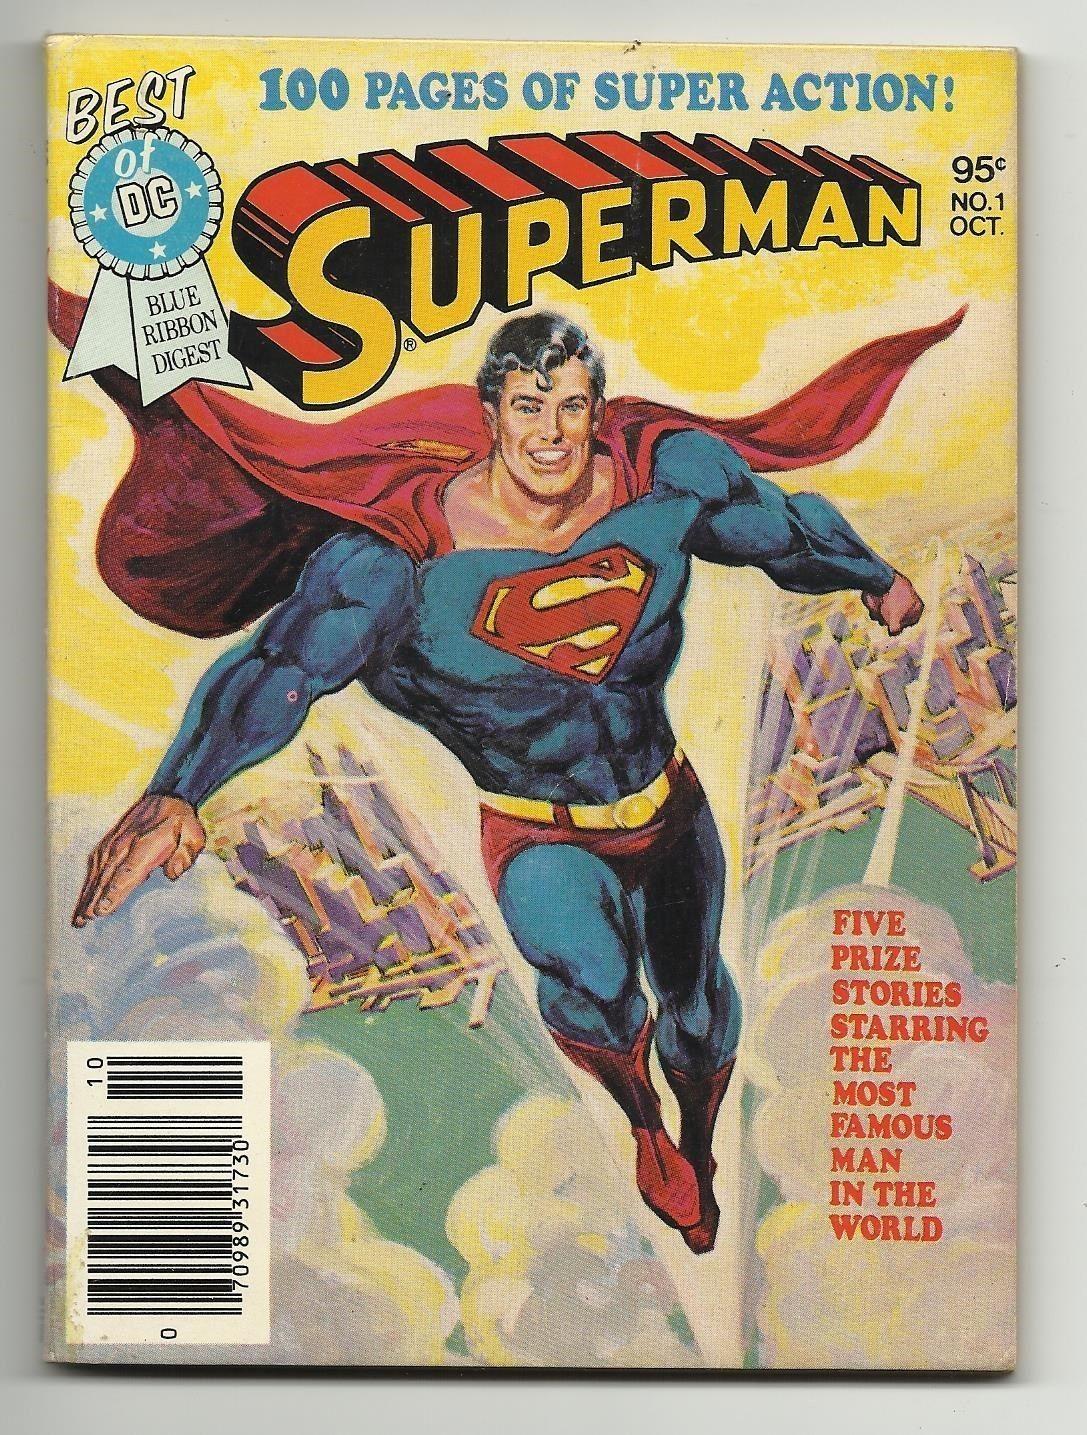 "Best of DC Blue Ribbon Digest #1 - Superman ""The Death of Superman"""